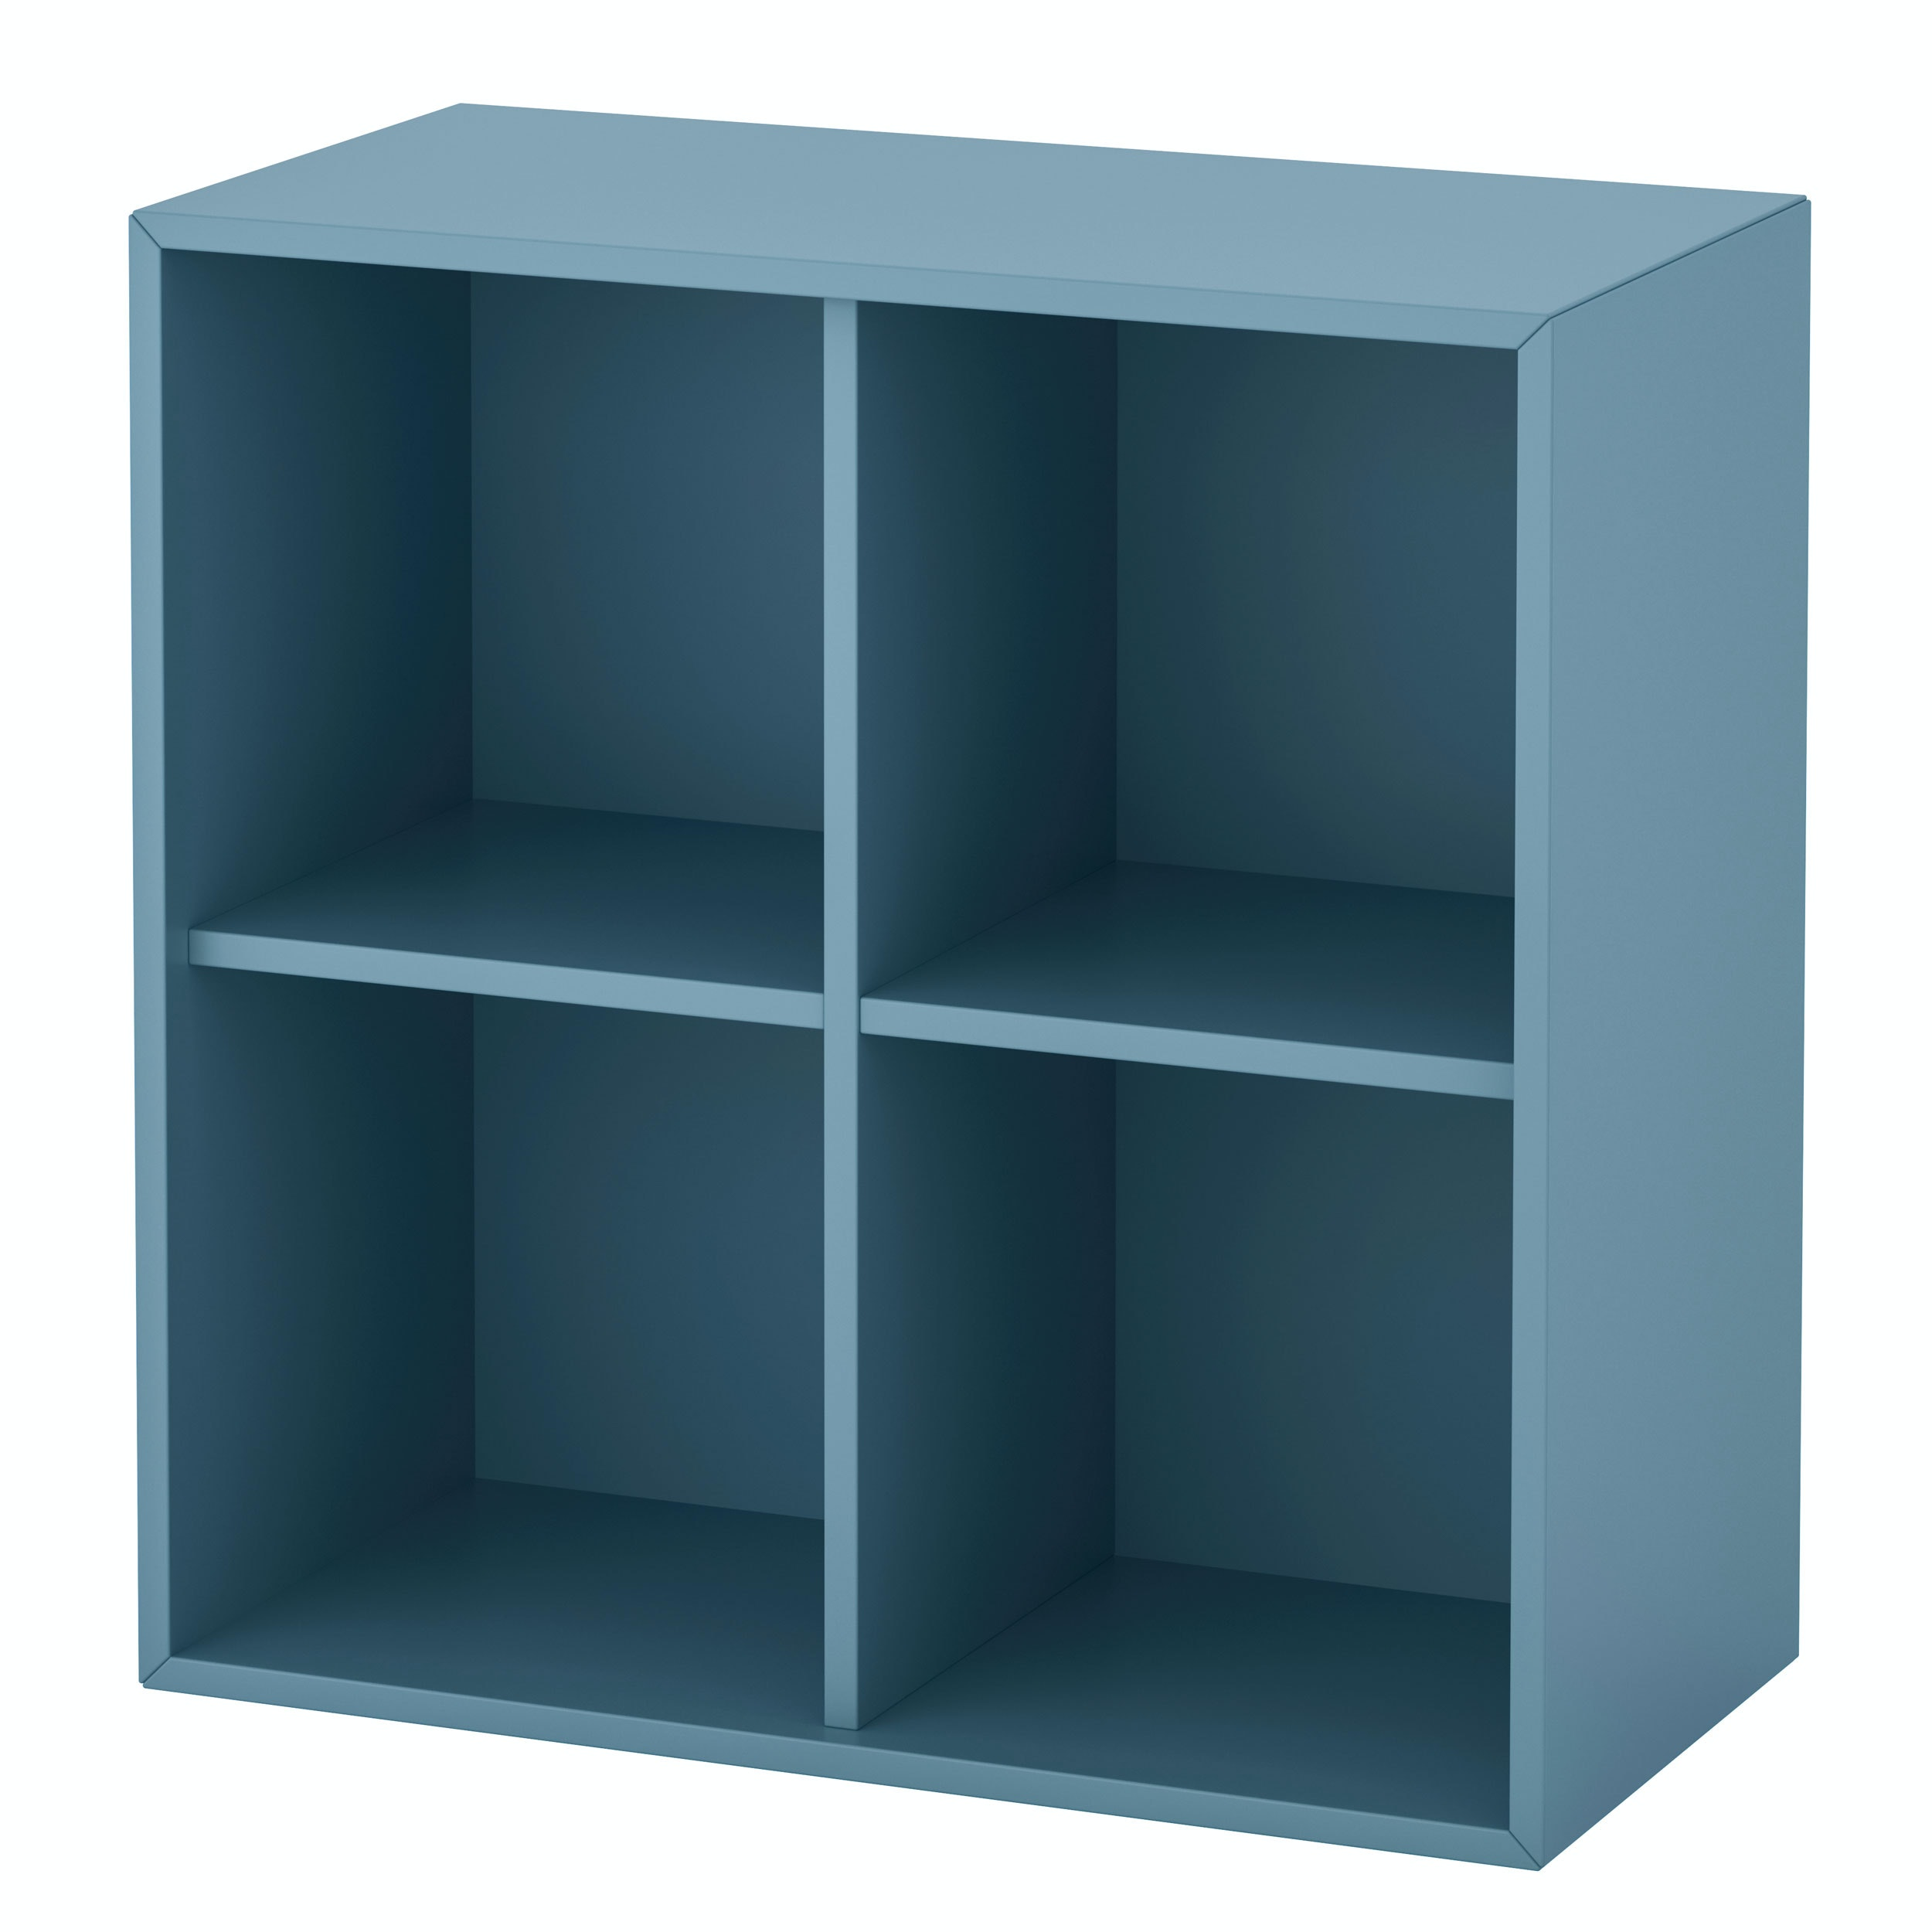 kallax regal pimpen expedit ikea hack ways to pimp the. Black Bedroom Furniture Sets. Home Design Ideas